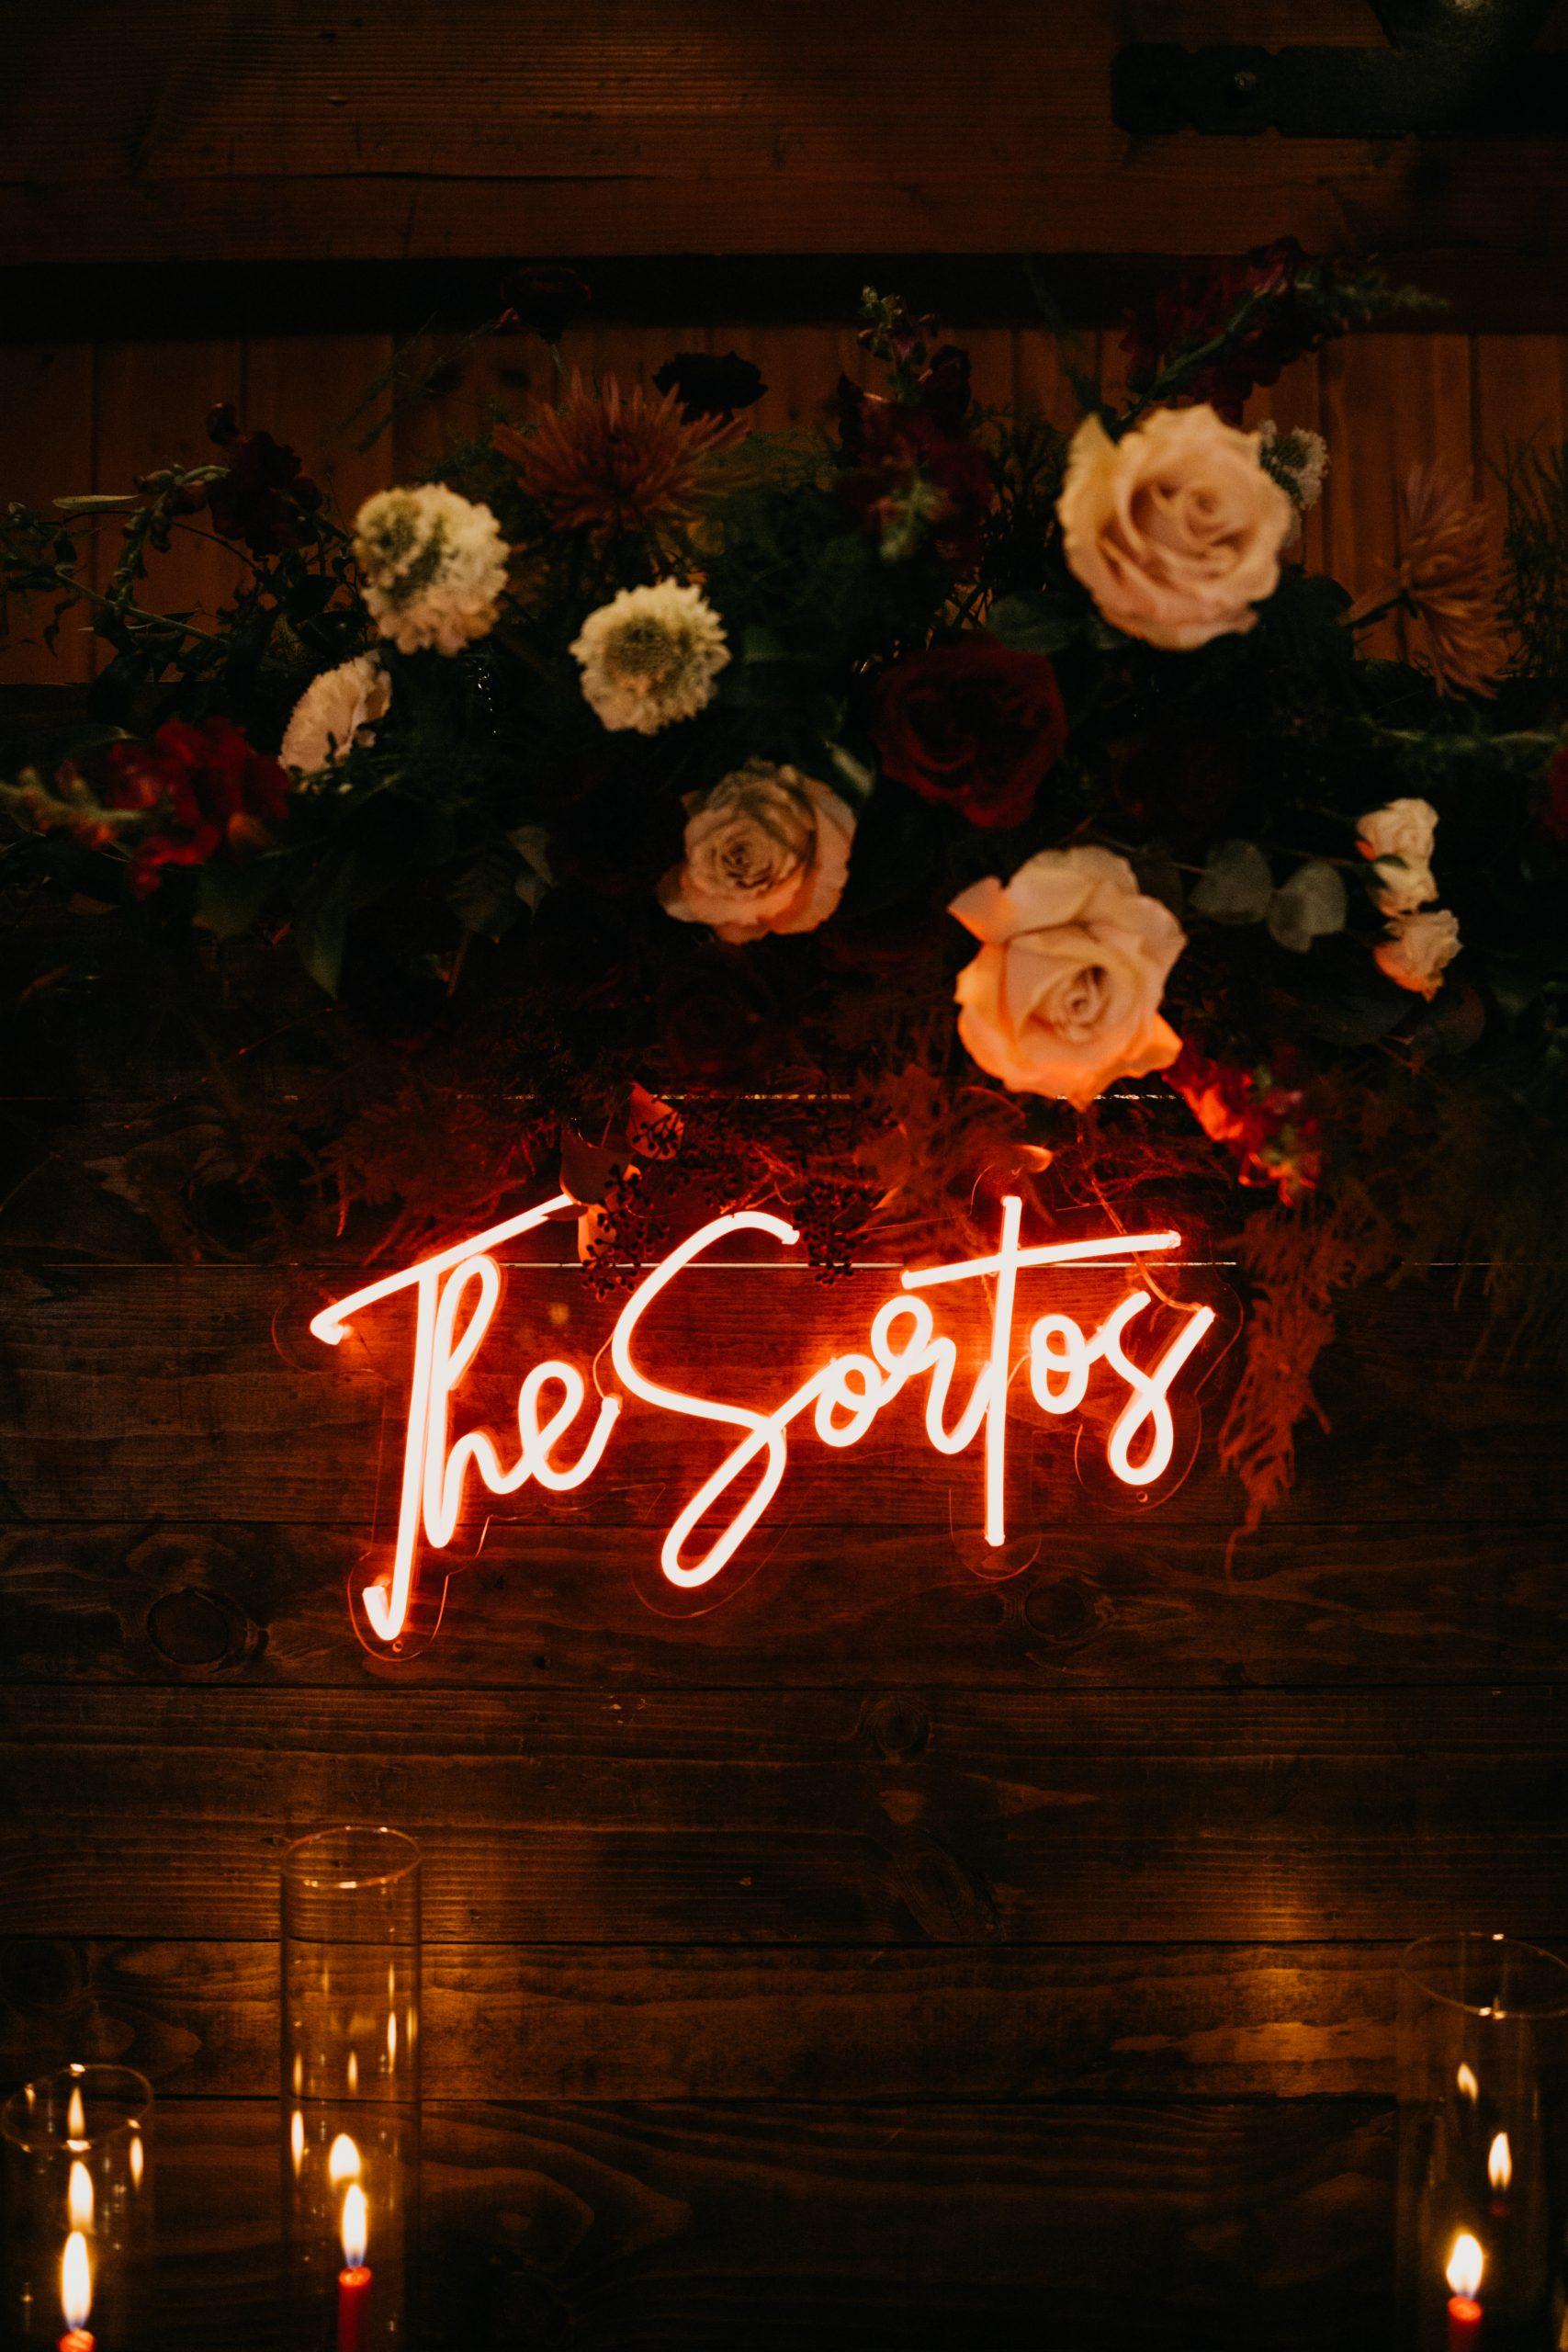 Neon Wedding Sign, Arrowhead Pine Rose Wedding, image by Fatima Elreda Photo